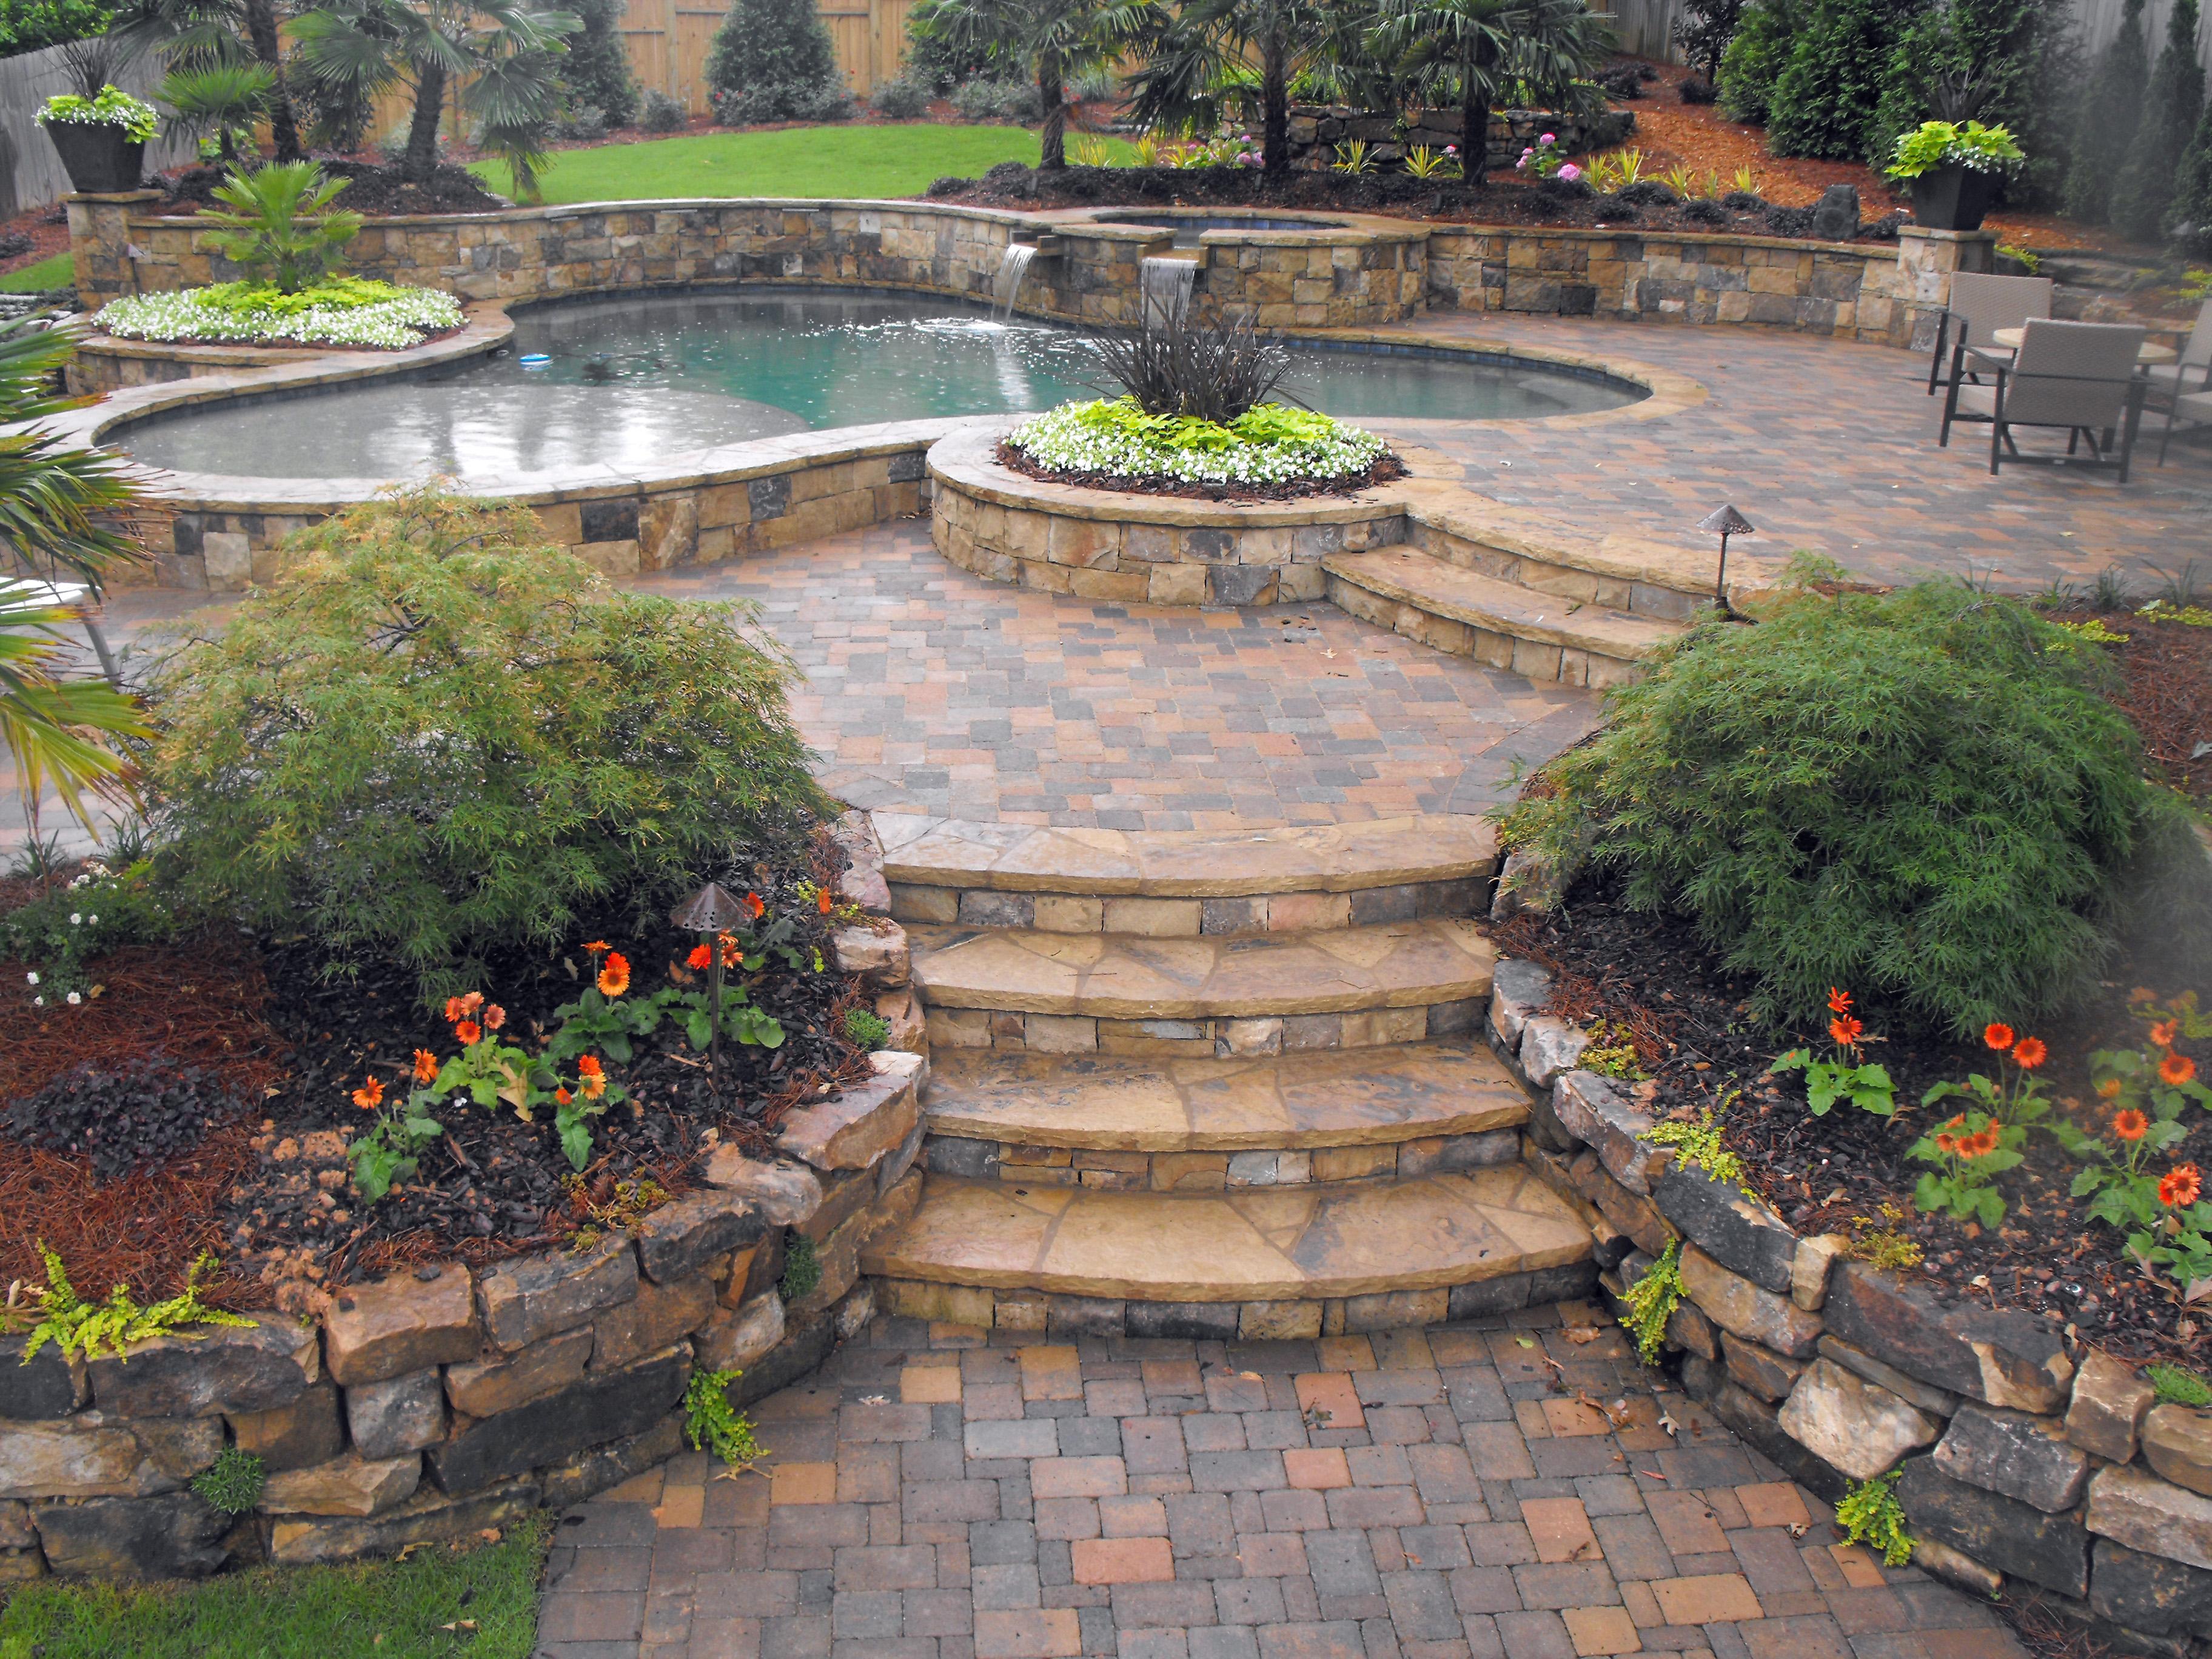 Home Design Backyard Ideas: Backyard-design-ideas-3648×2736-hardscape-sets-the-stage